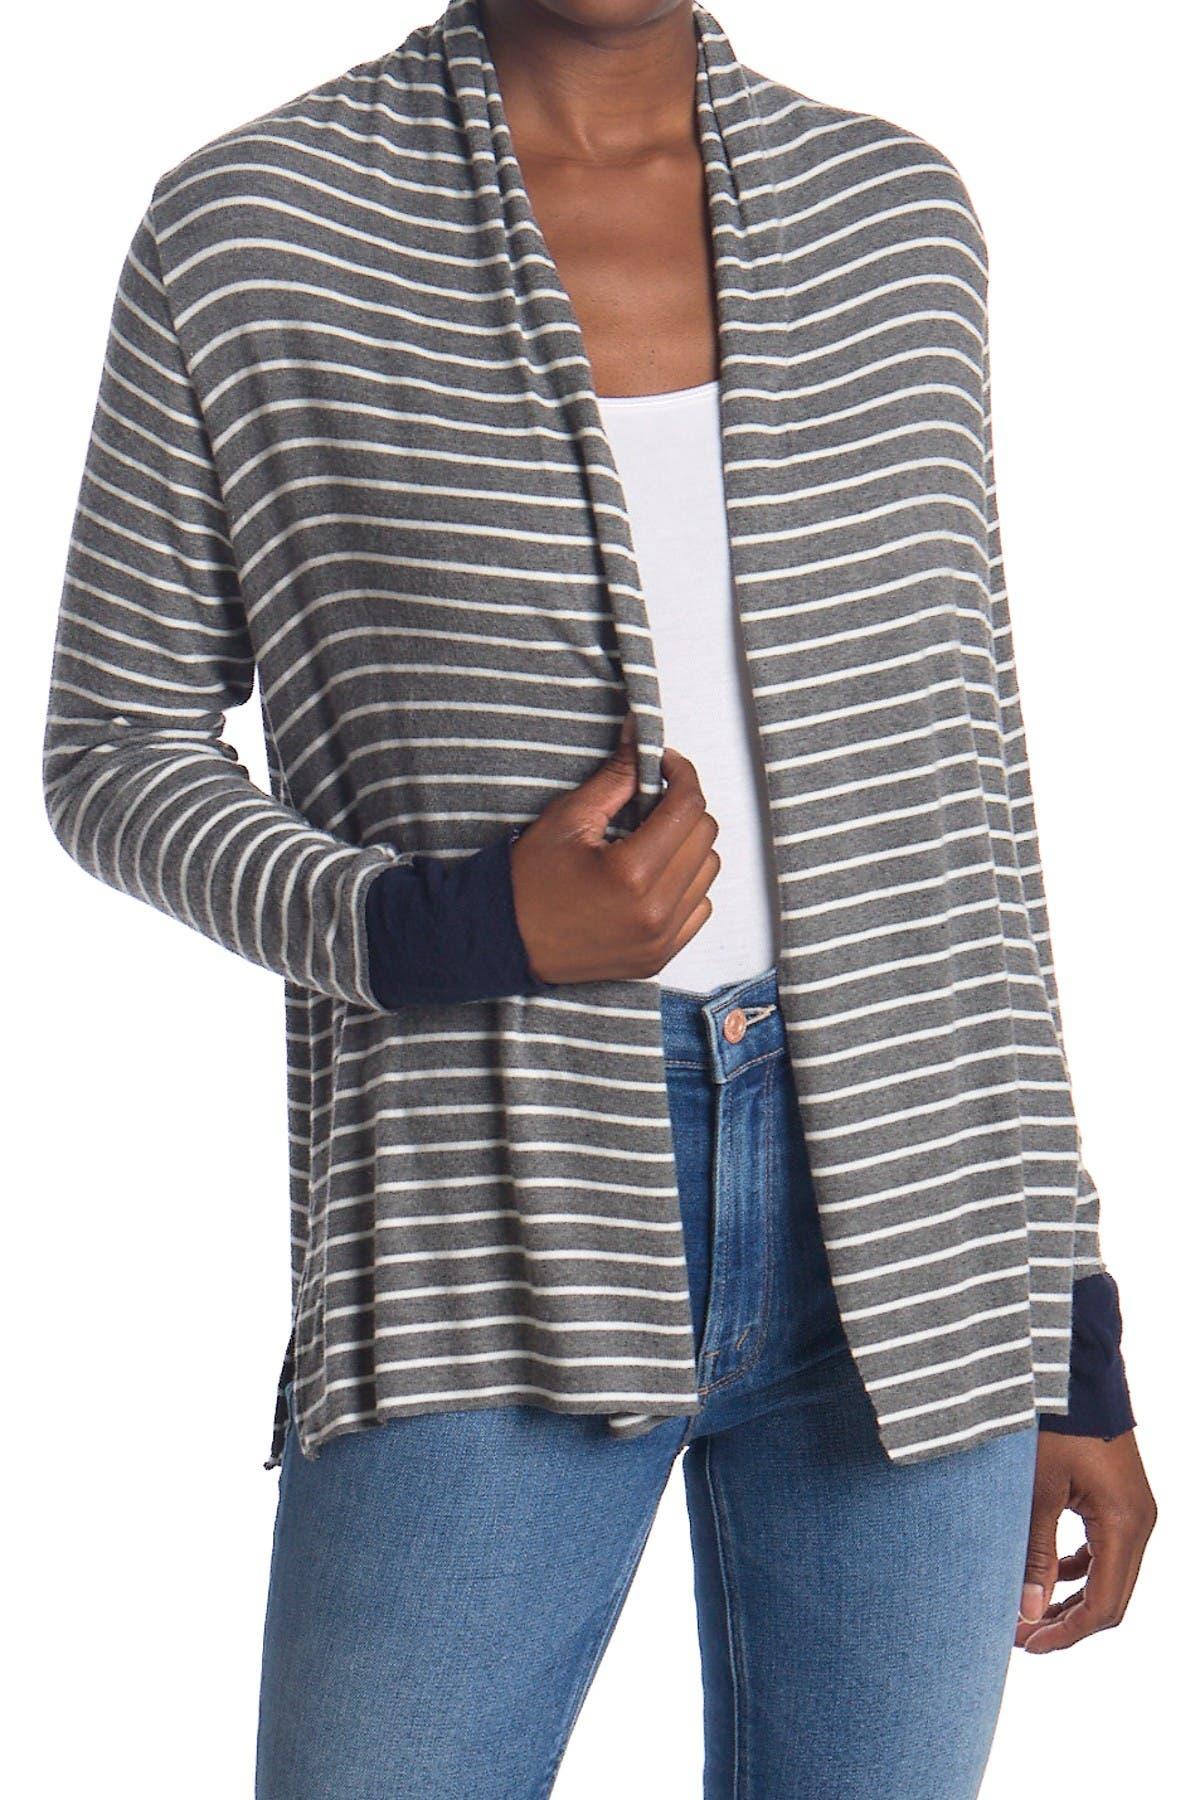 Image of Michael Stars Jessenia Striped Open Front Cardigan